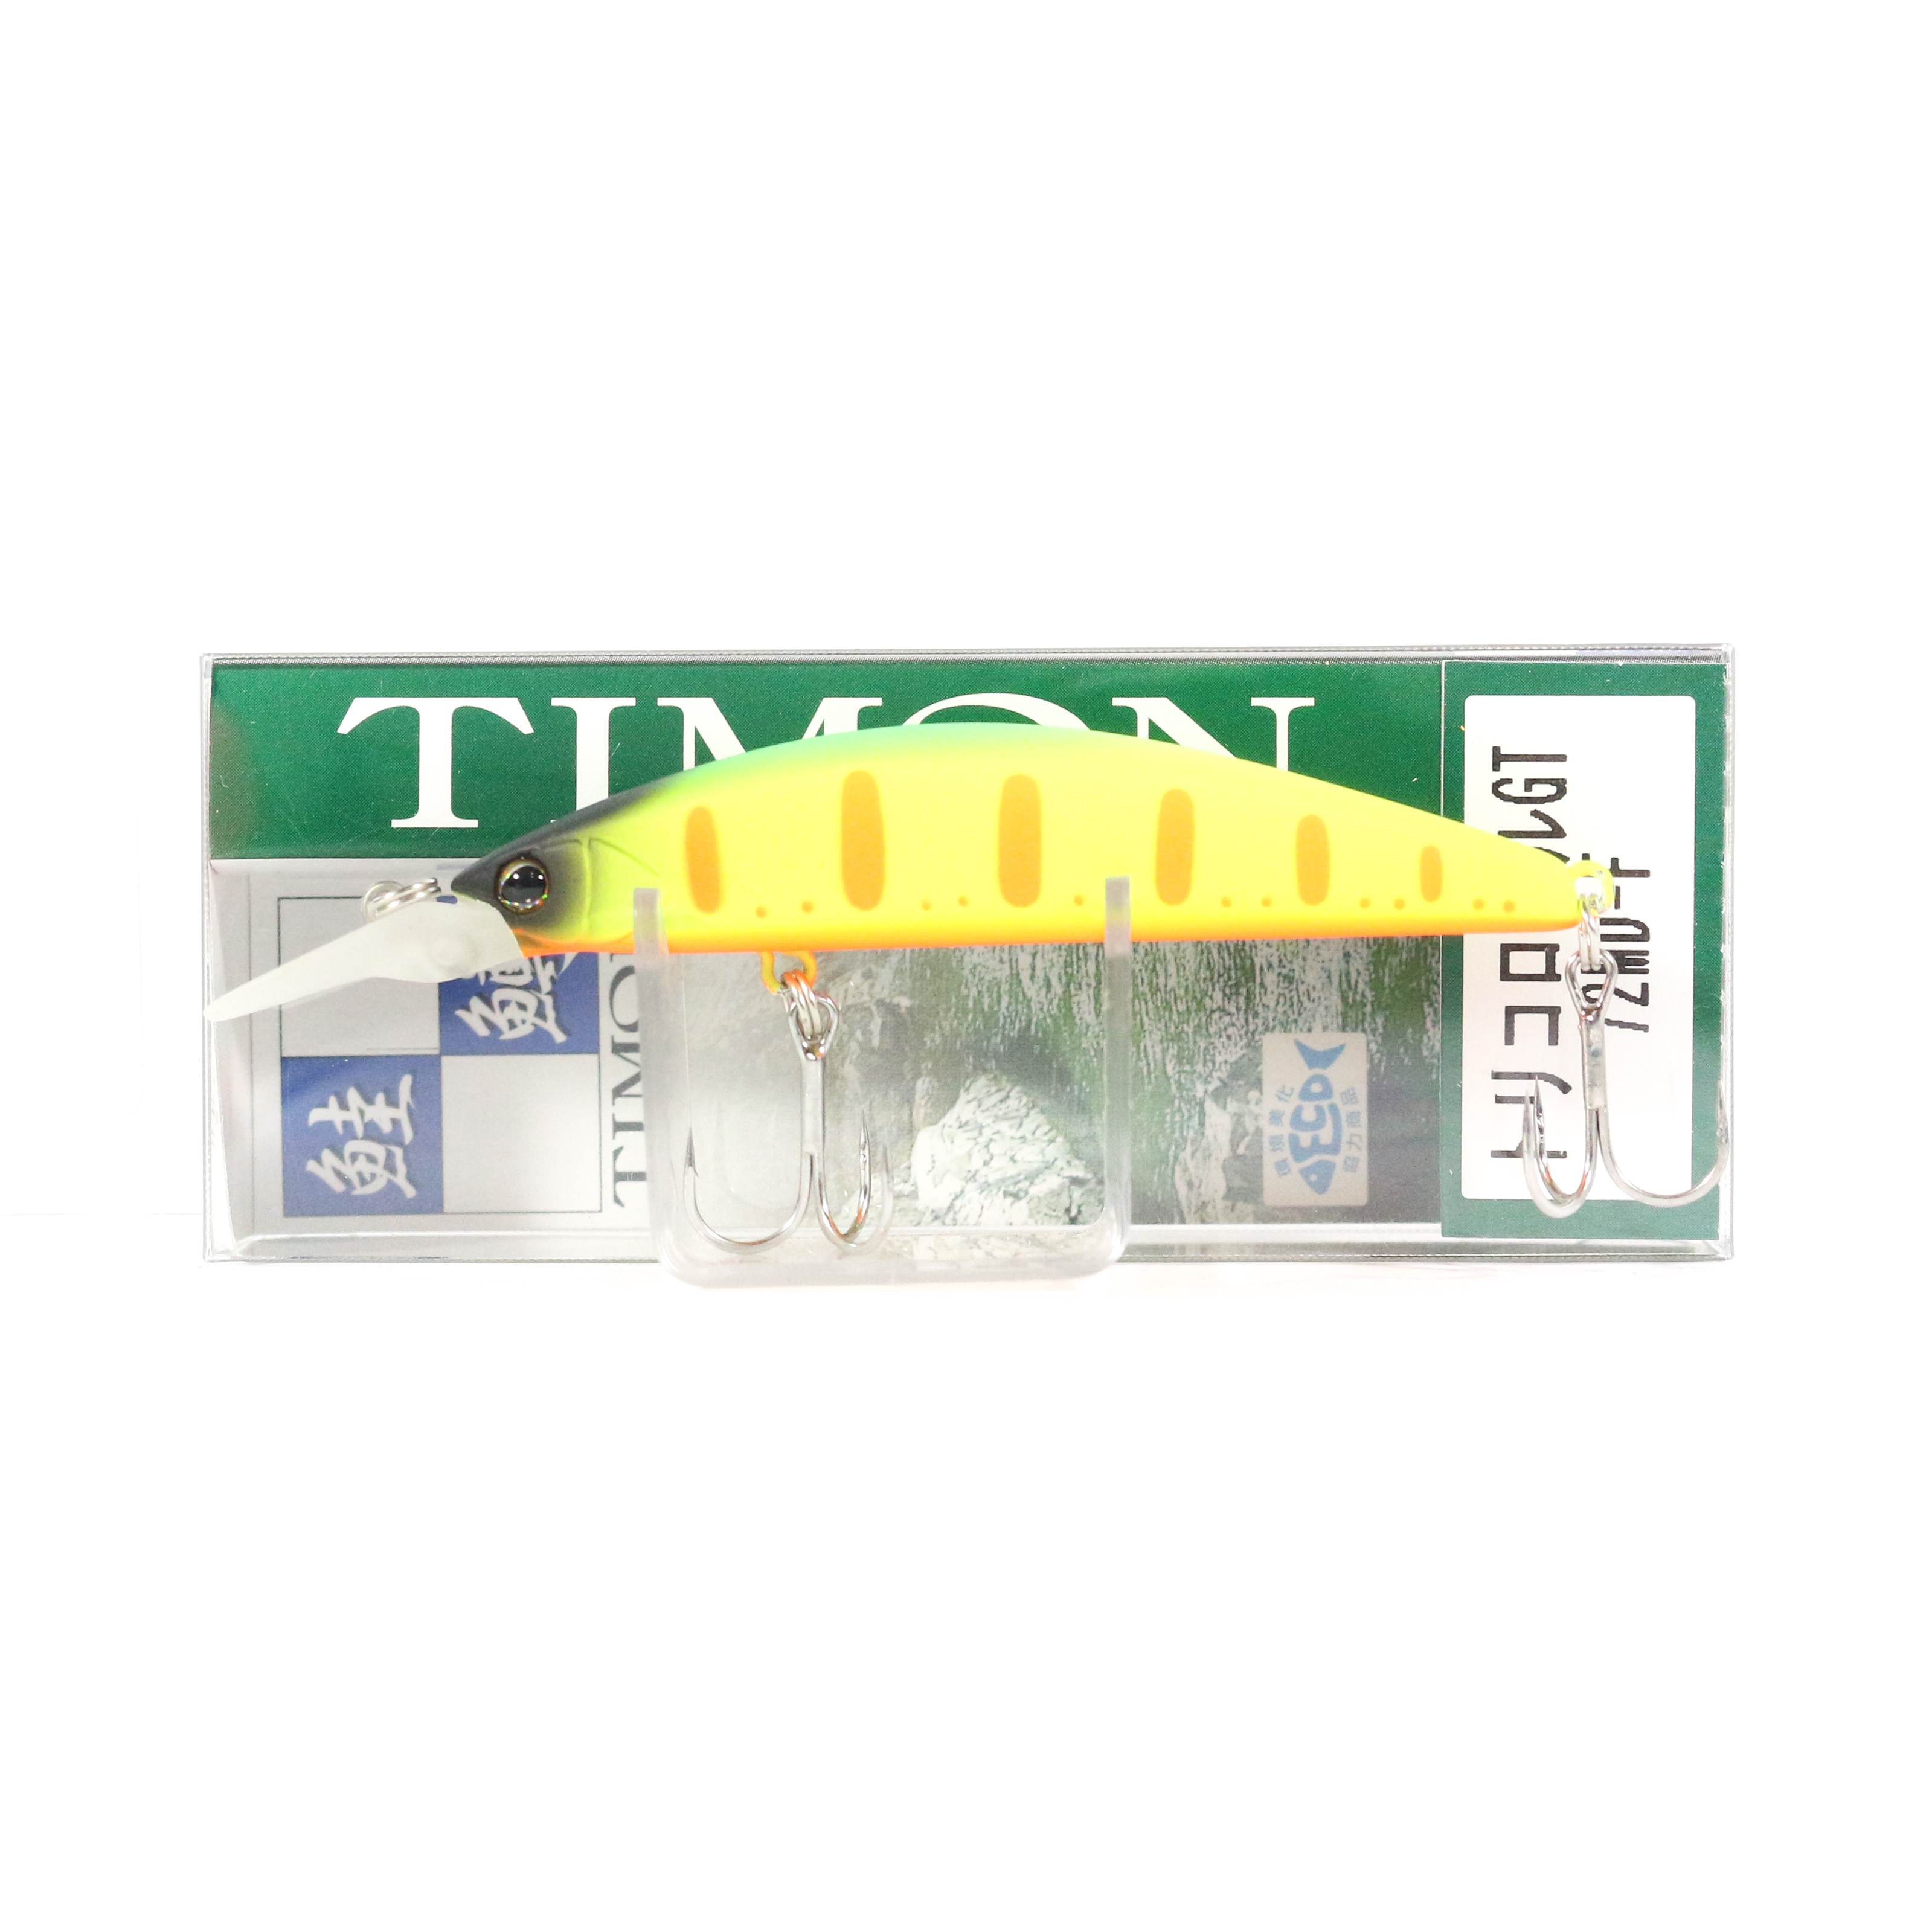 JACKALL TIMON Tricoroll GT 72MD-F 6.6g KITAMURA GP FLASH